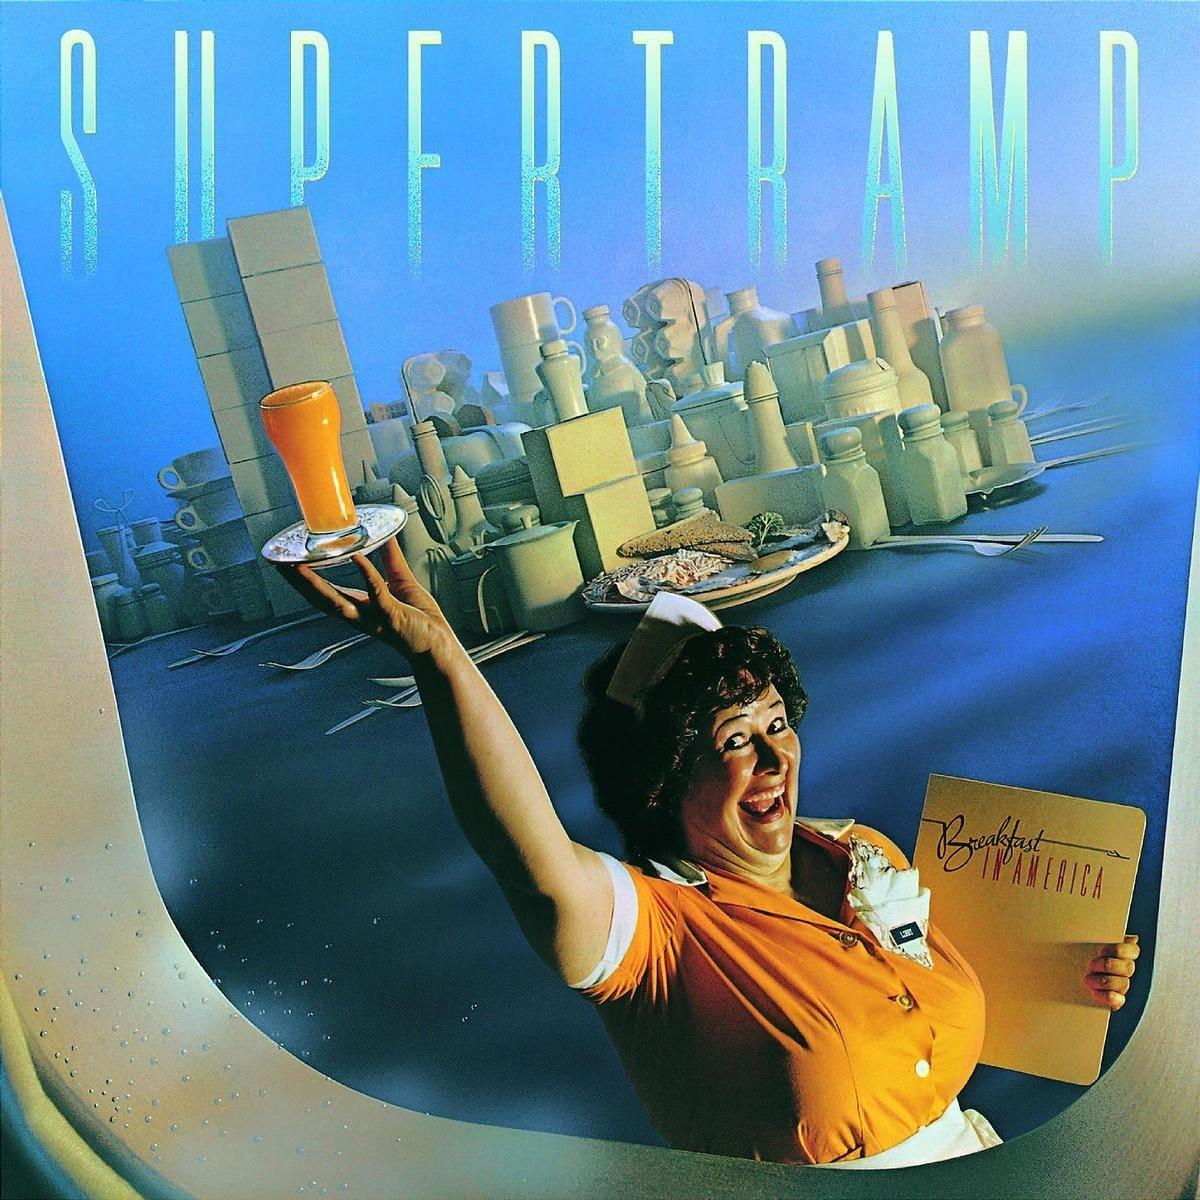 Đang tải tinhte_supertramp_breakfast_in_america_2.JPG…